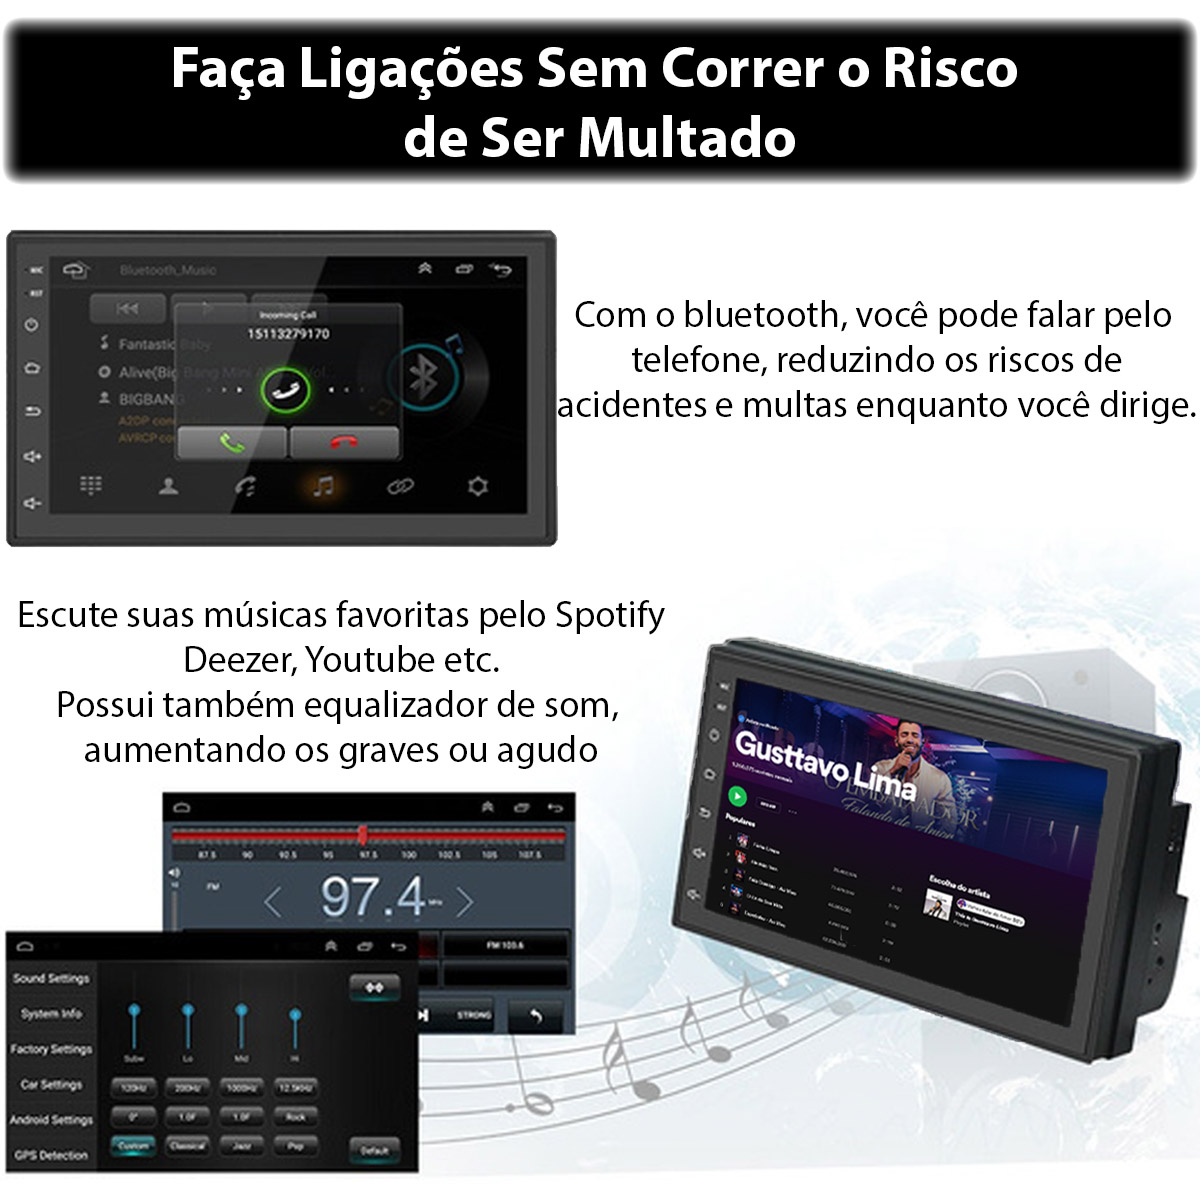 Central Multimídia Nissan Kicks Muzik Android com Câmera de Ré 7 Polegadas 2 Din Moldura Black Piano Poliparts